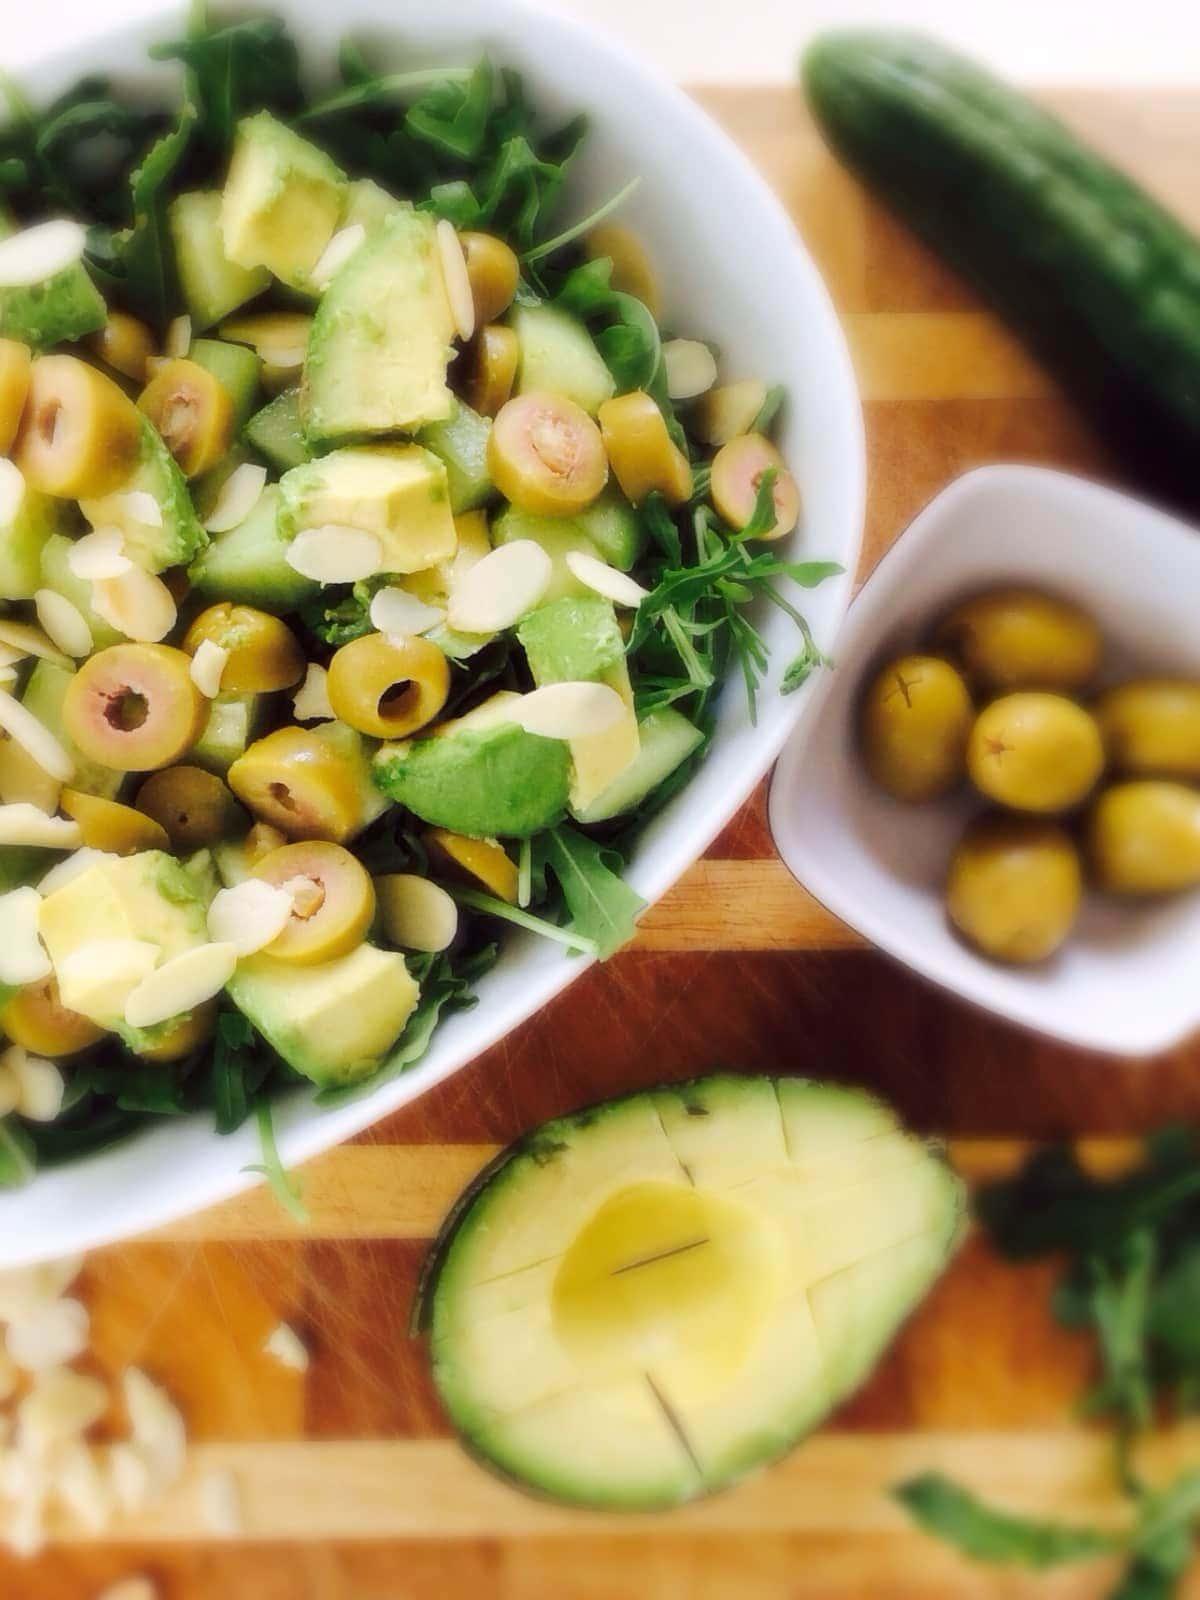 Green Summer Salad - The Girl Creative